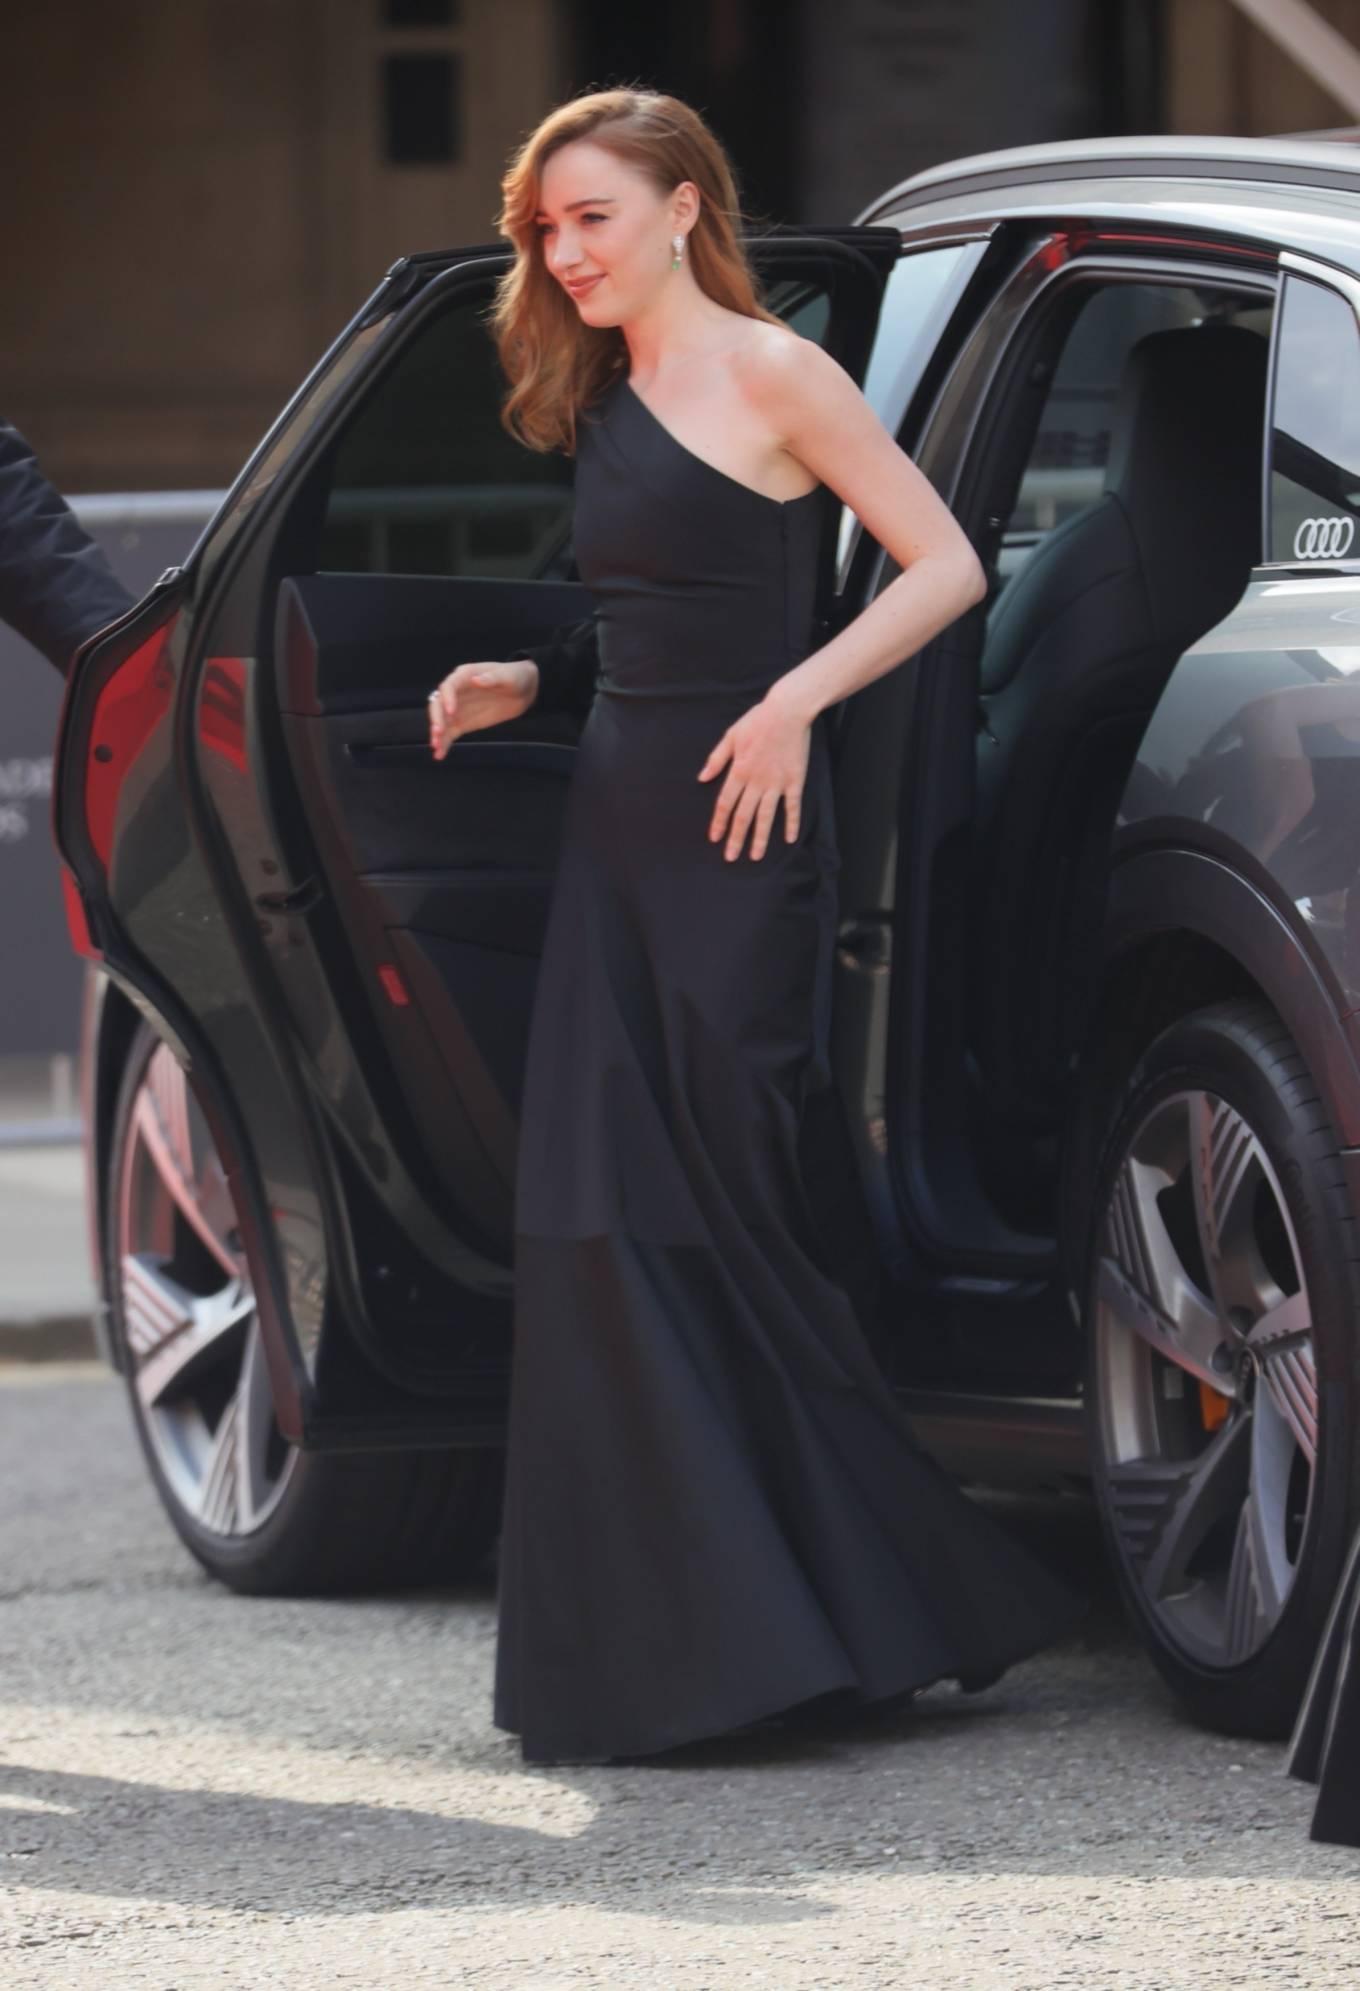 Phoebe Dynevor 2021 : Phoebe Dynevor – at the Royal Albert Hall for 2021 British Academy Film Awards in London-18